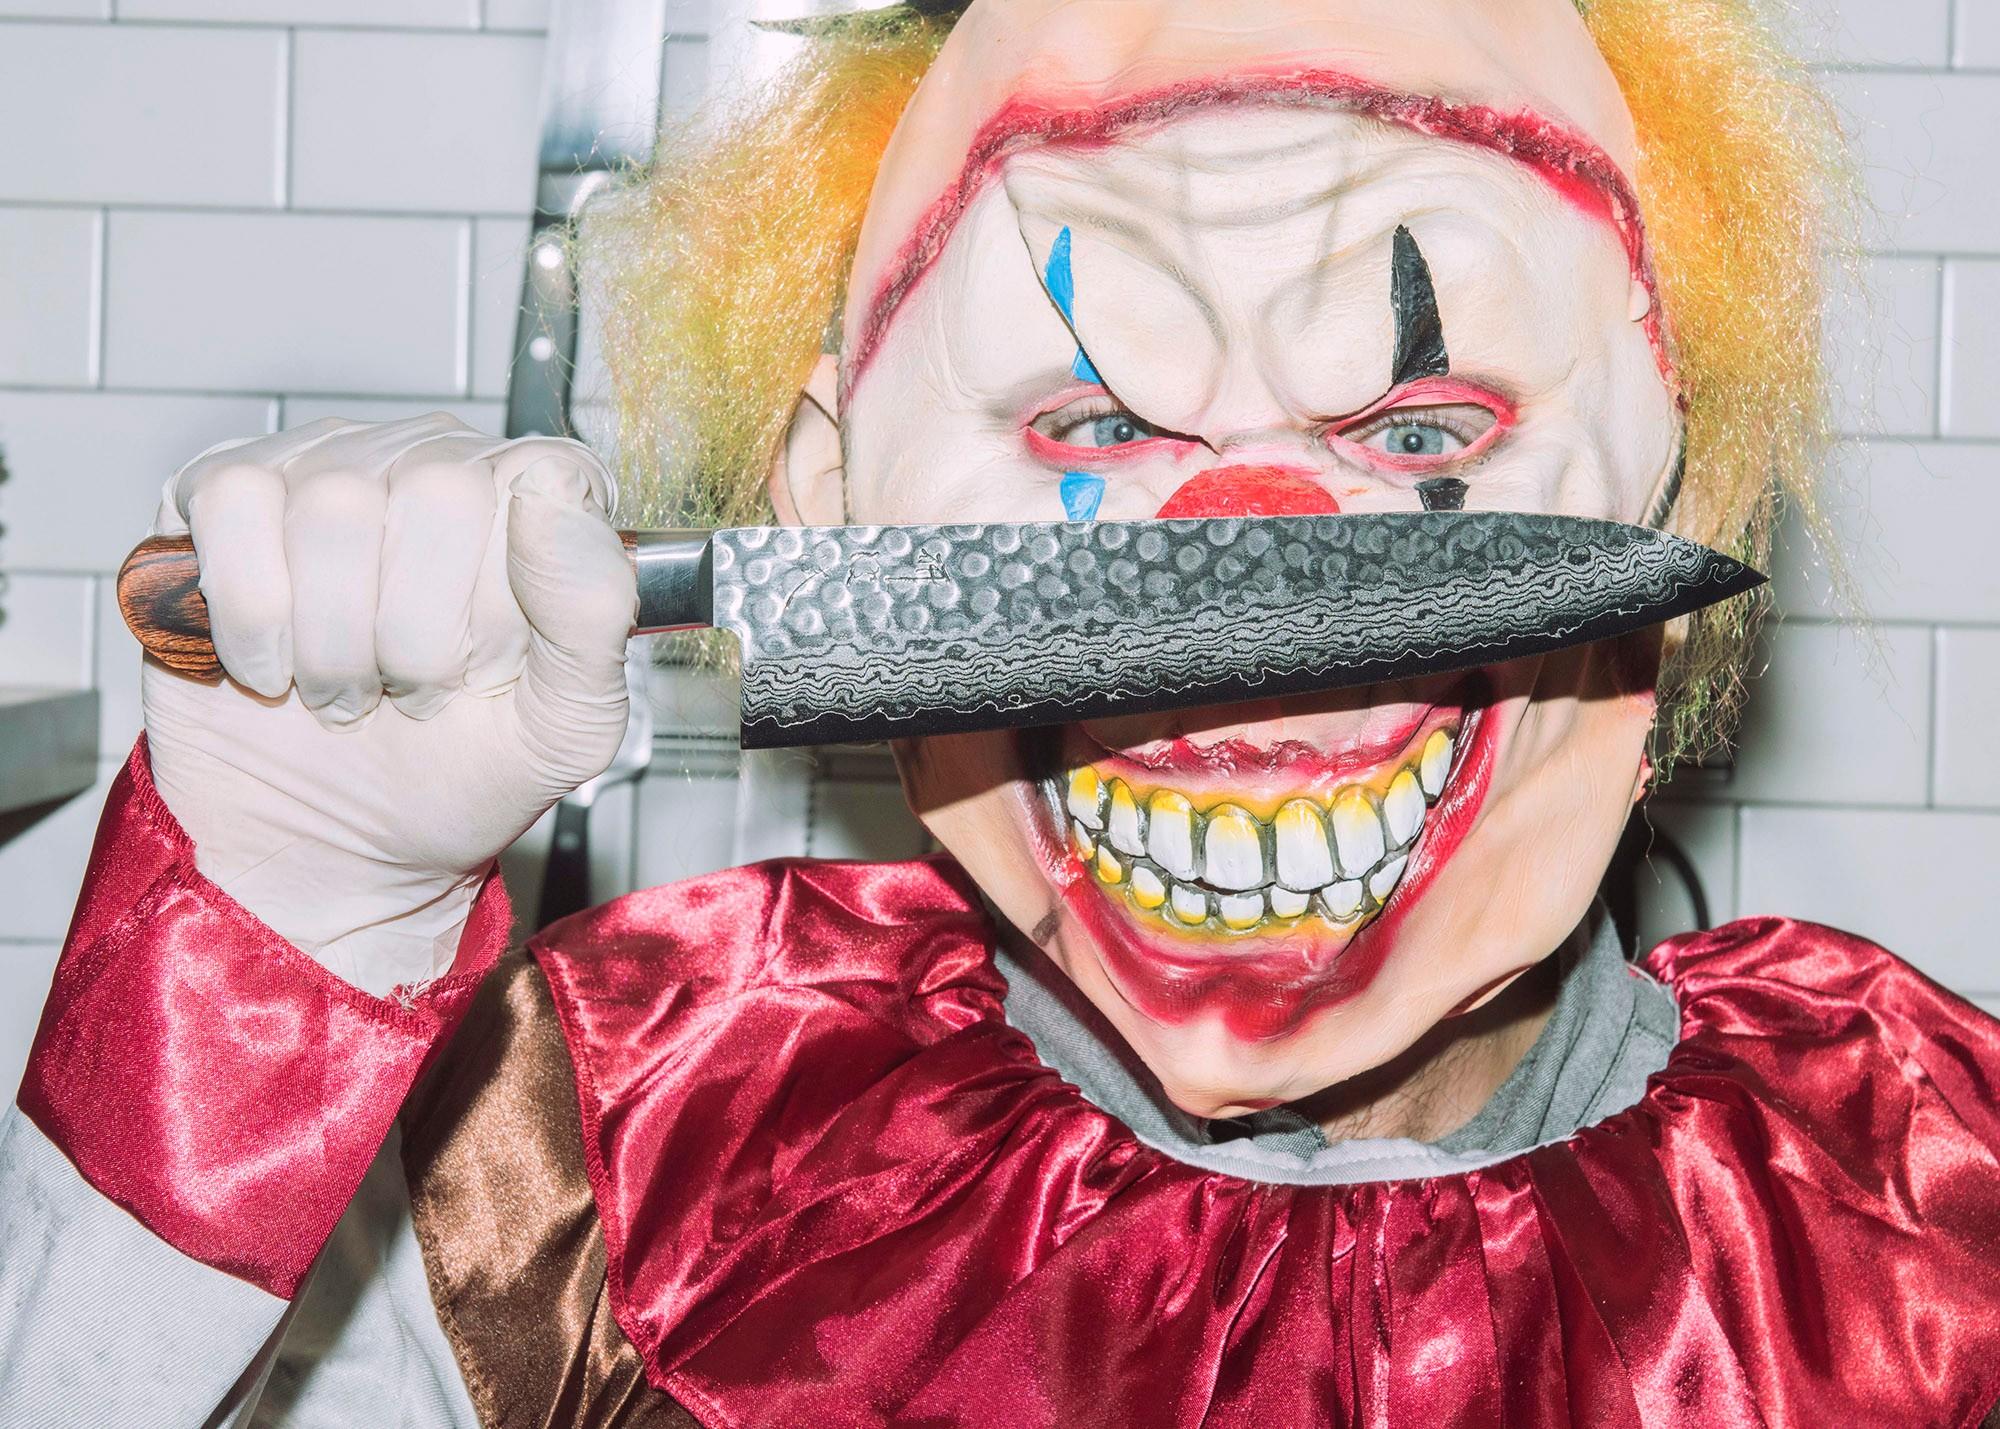 clown-knives-shoot-5